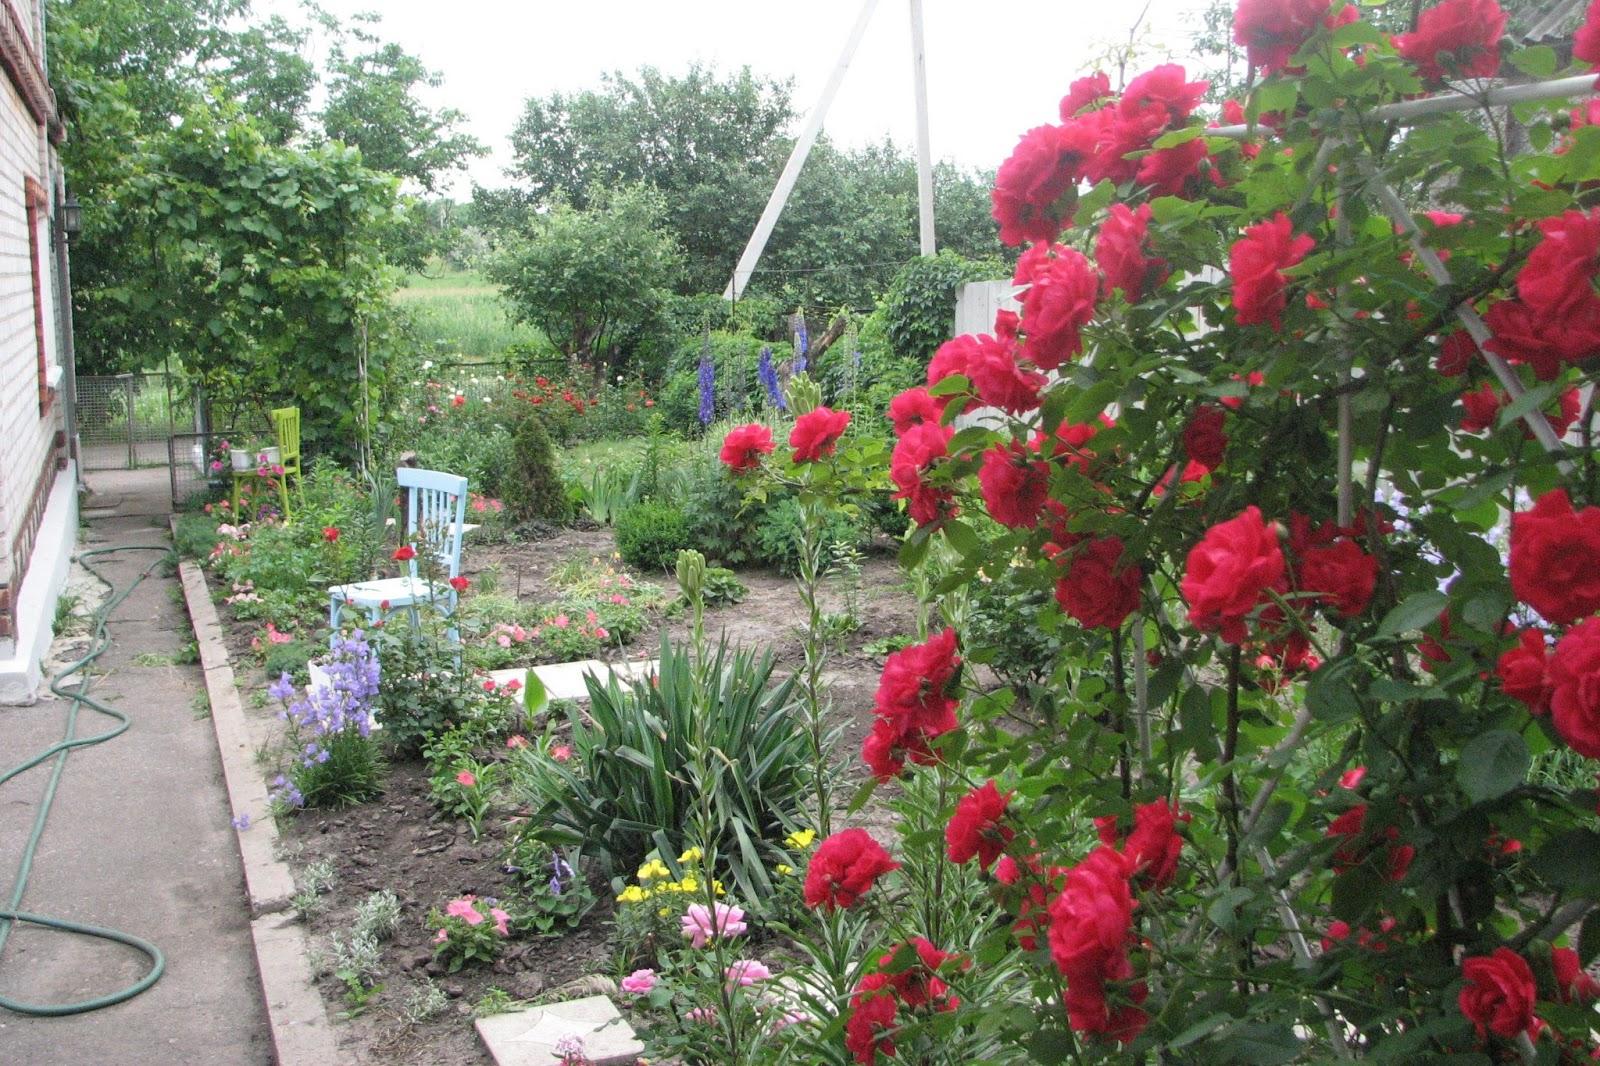 The blog fodder june 2013 - Climbing rose trellis ...